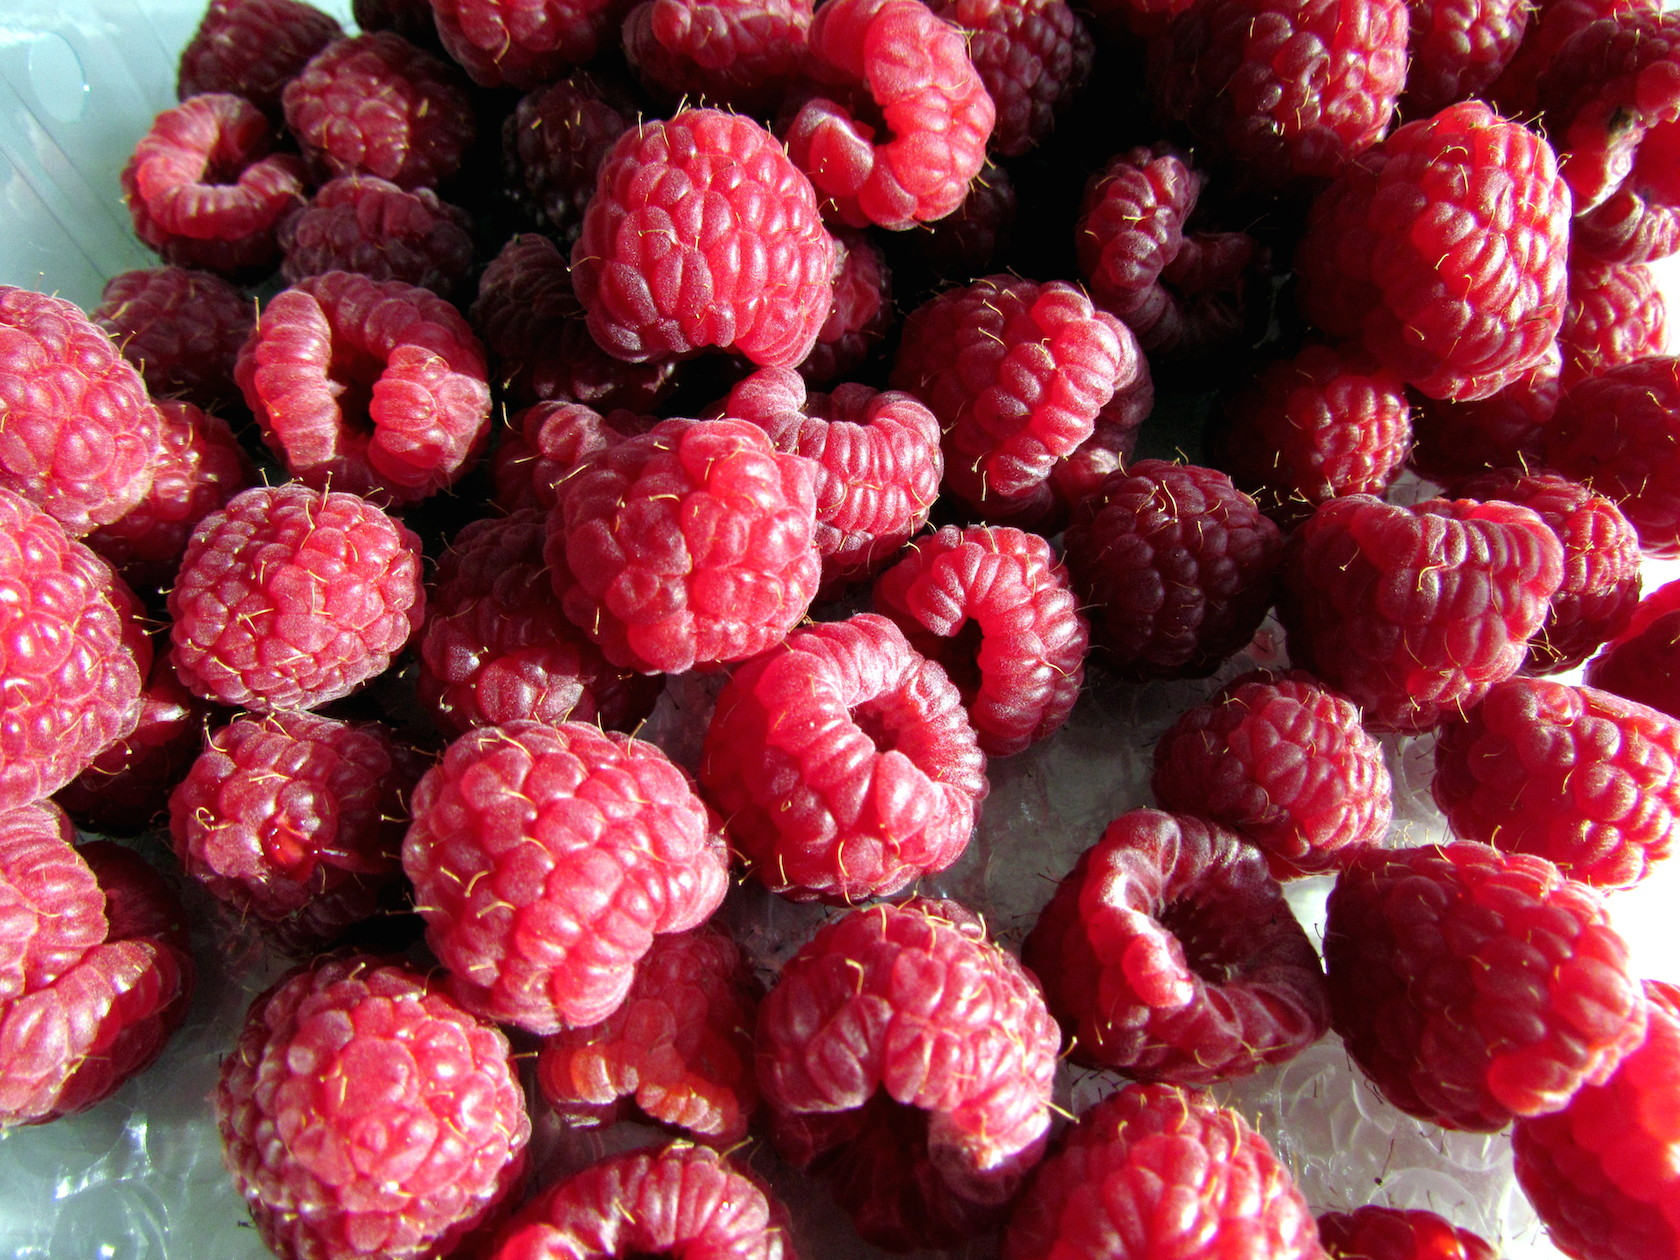 seasonal produce guide for switzerland: june